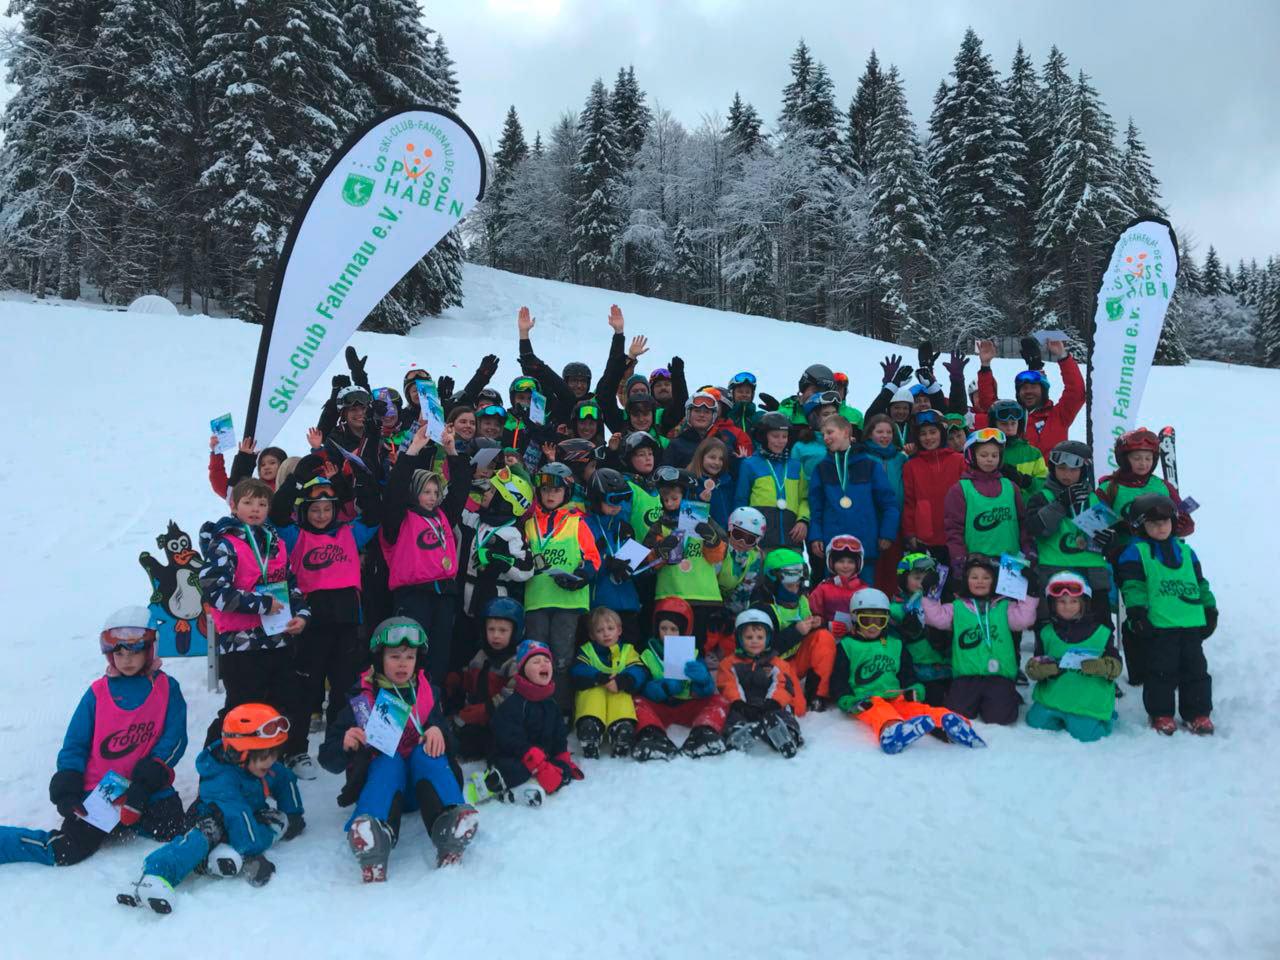 Ski-Club-Fahrnau mit vielseitigem Winterprogramm - meinWiesental.de